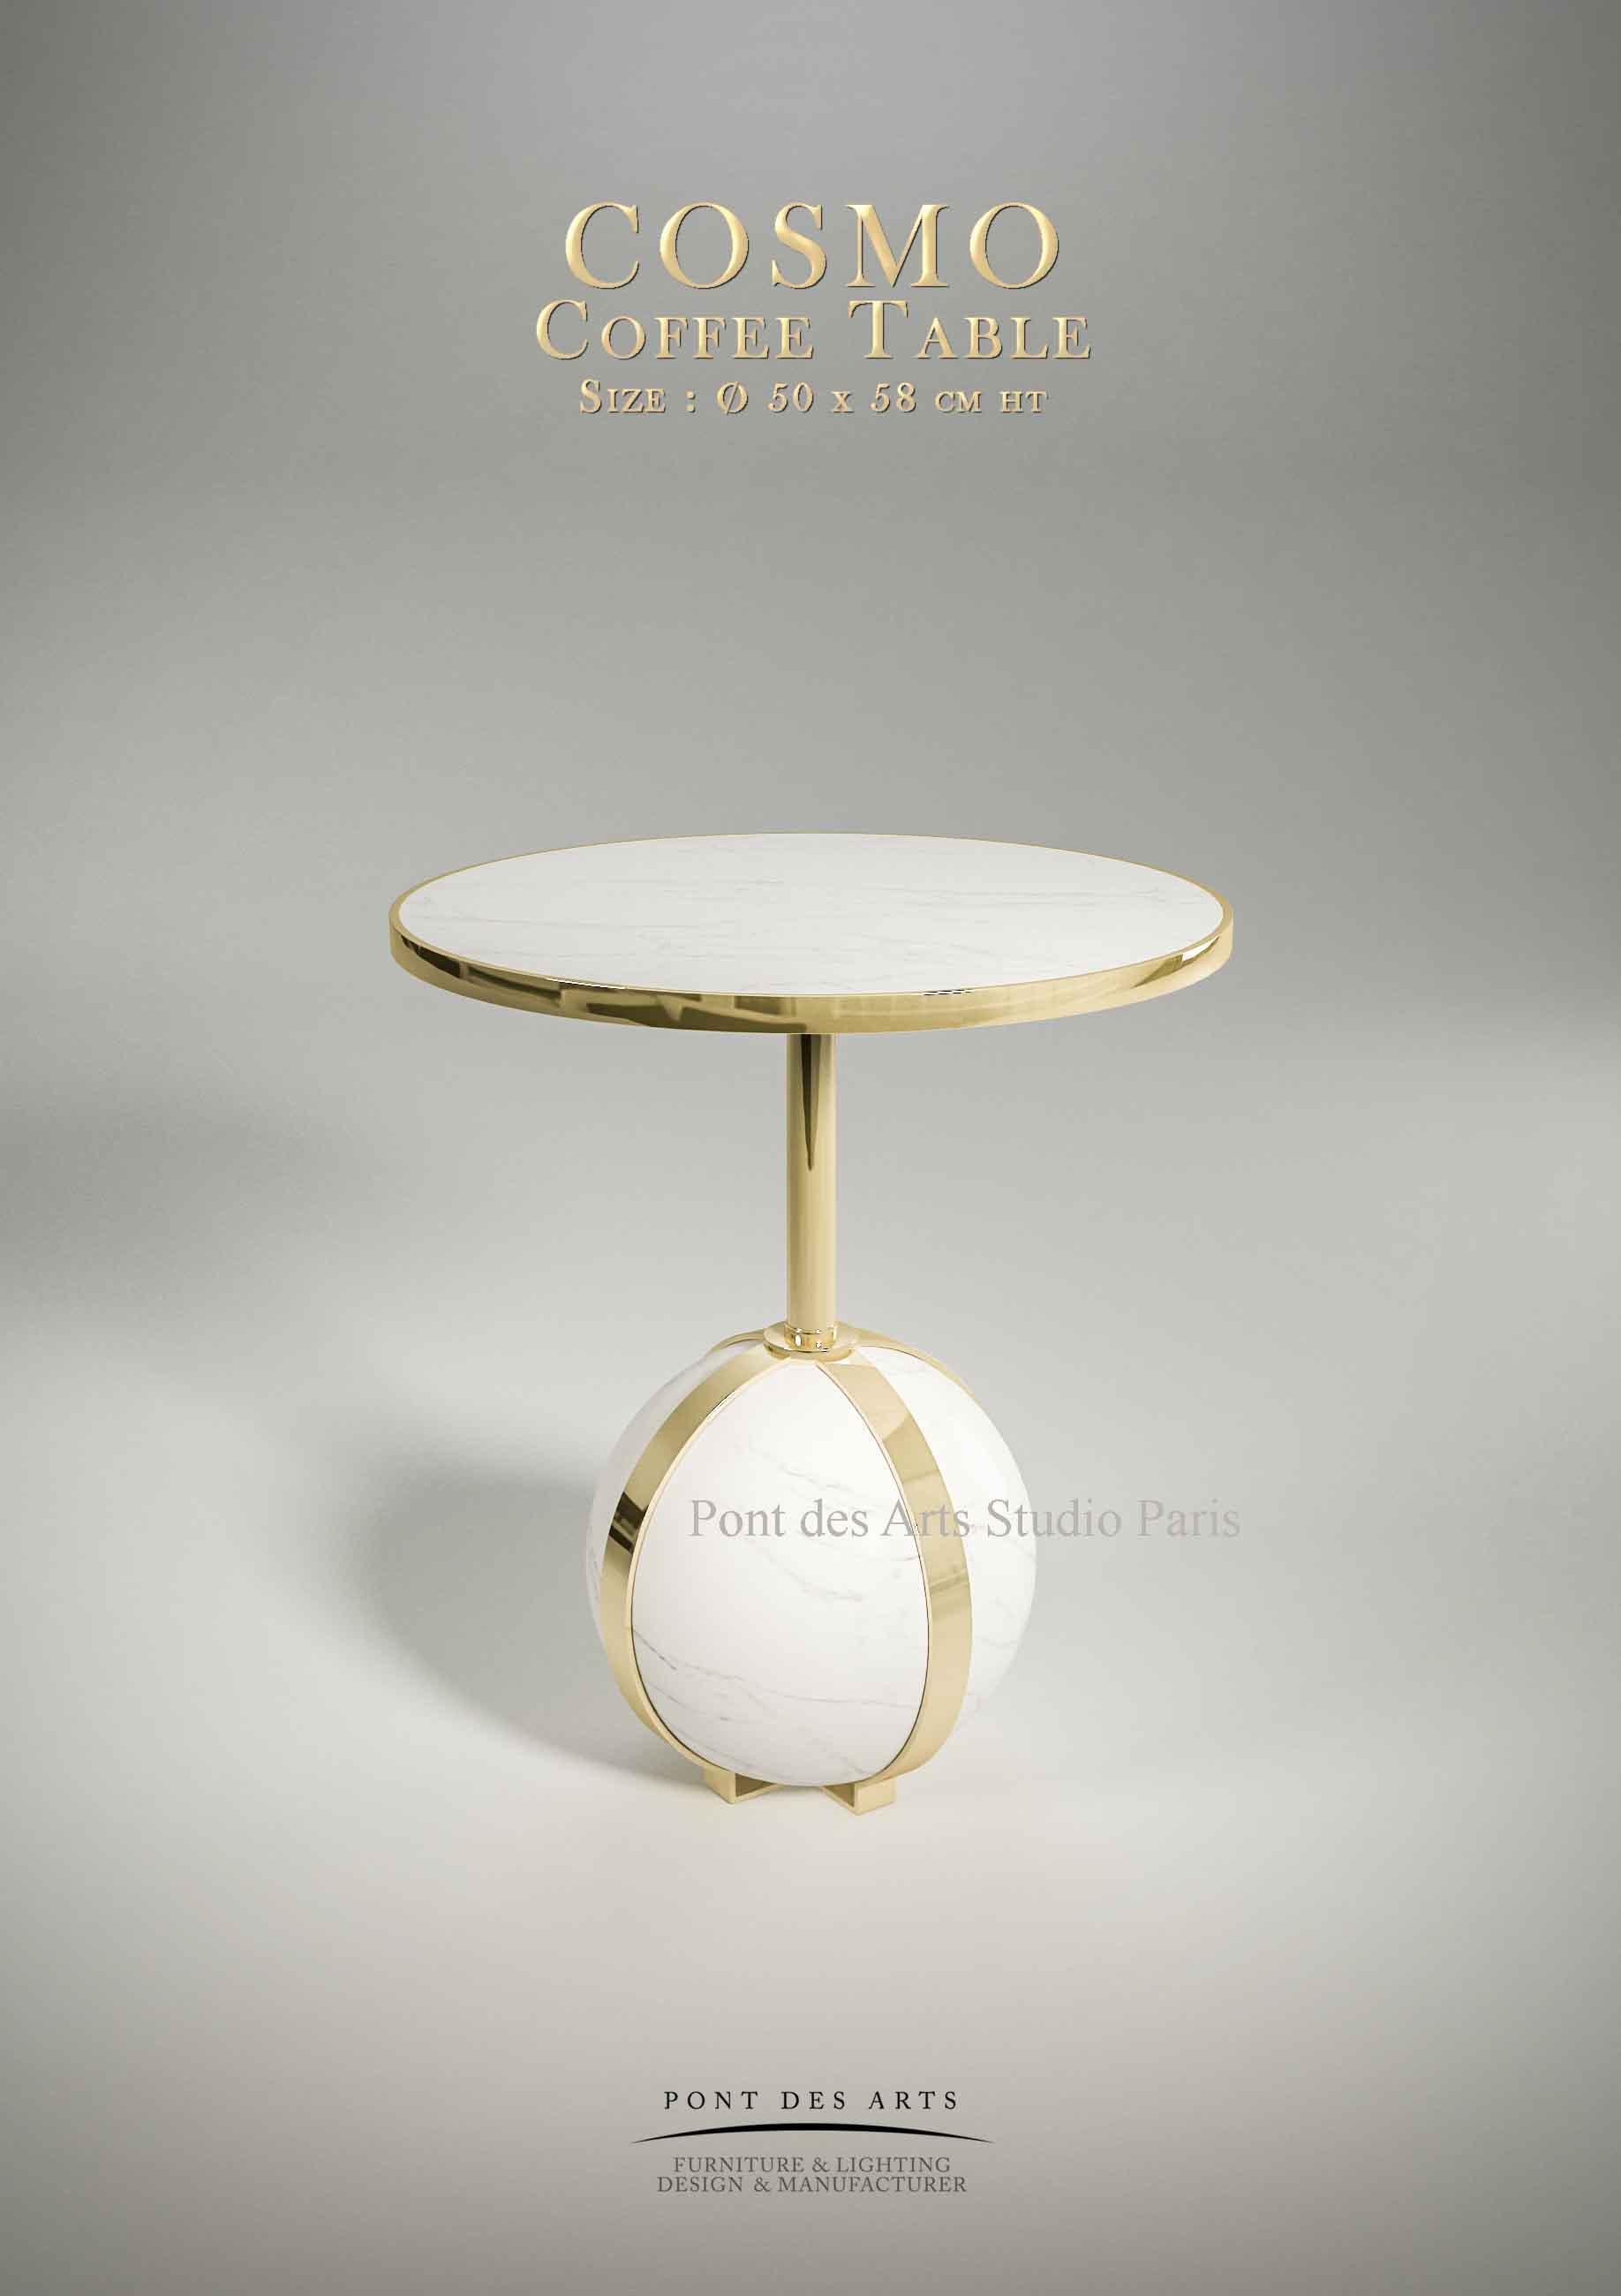 Cosmo Coffee Table Pont Des Arts